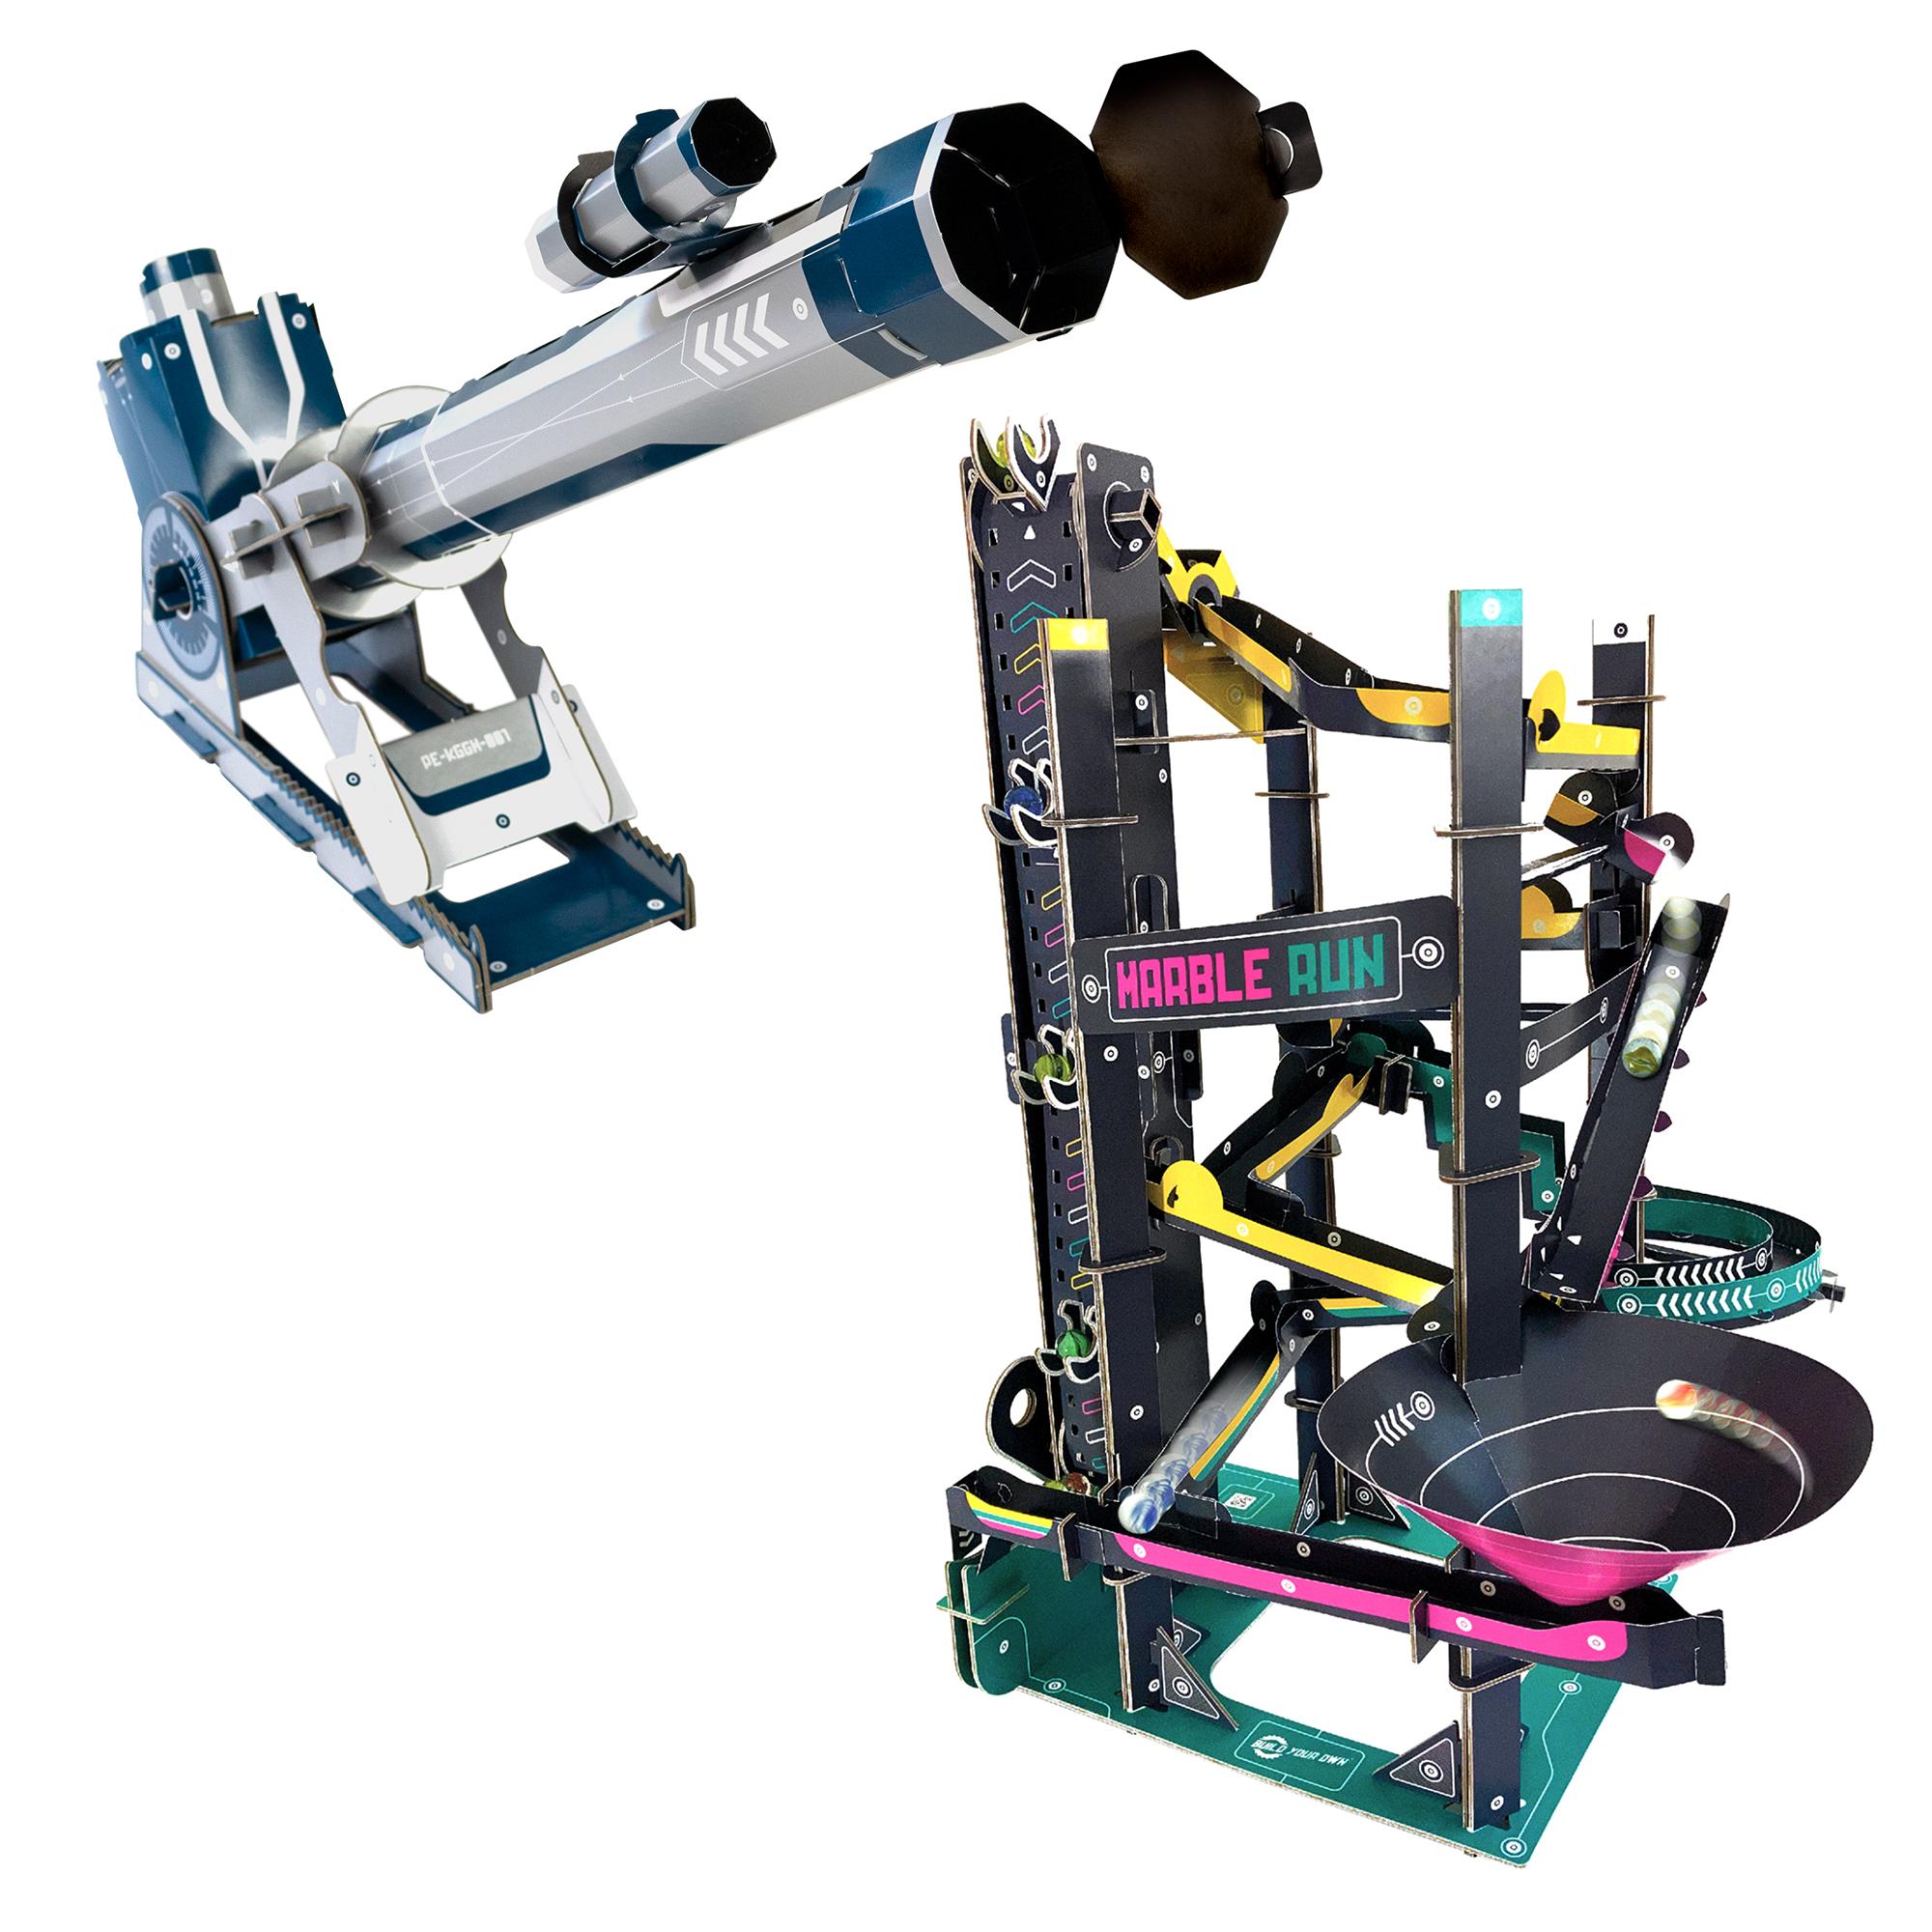 Telescope and Marble Run